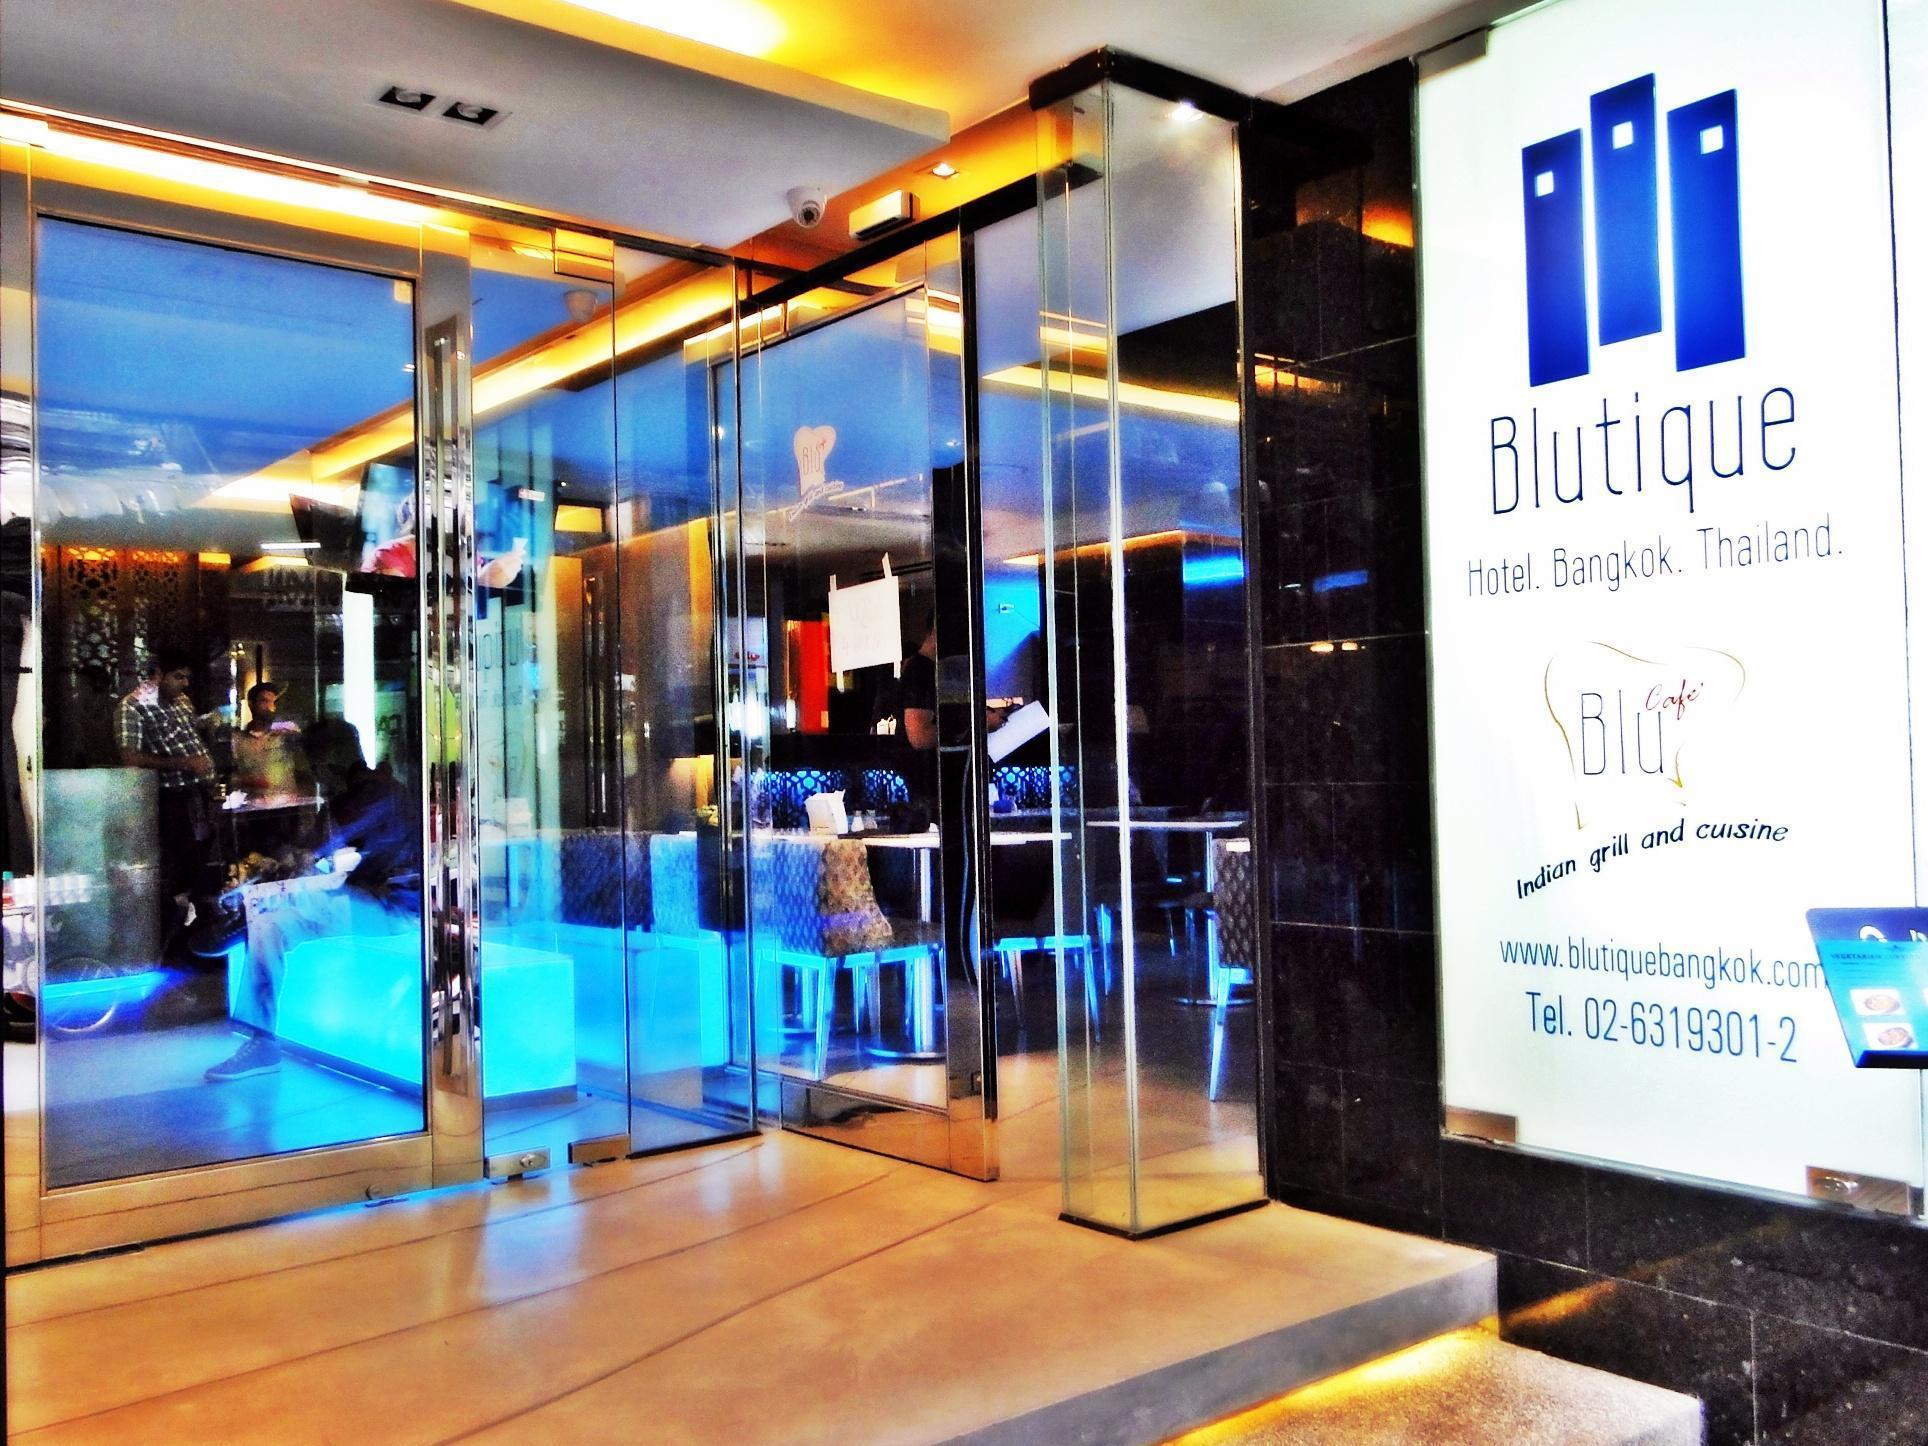 Blutique Hotel บลูติคโฮเต็ล